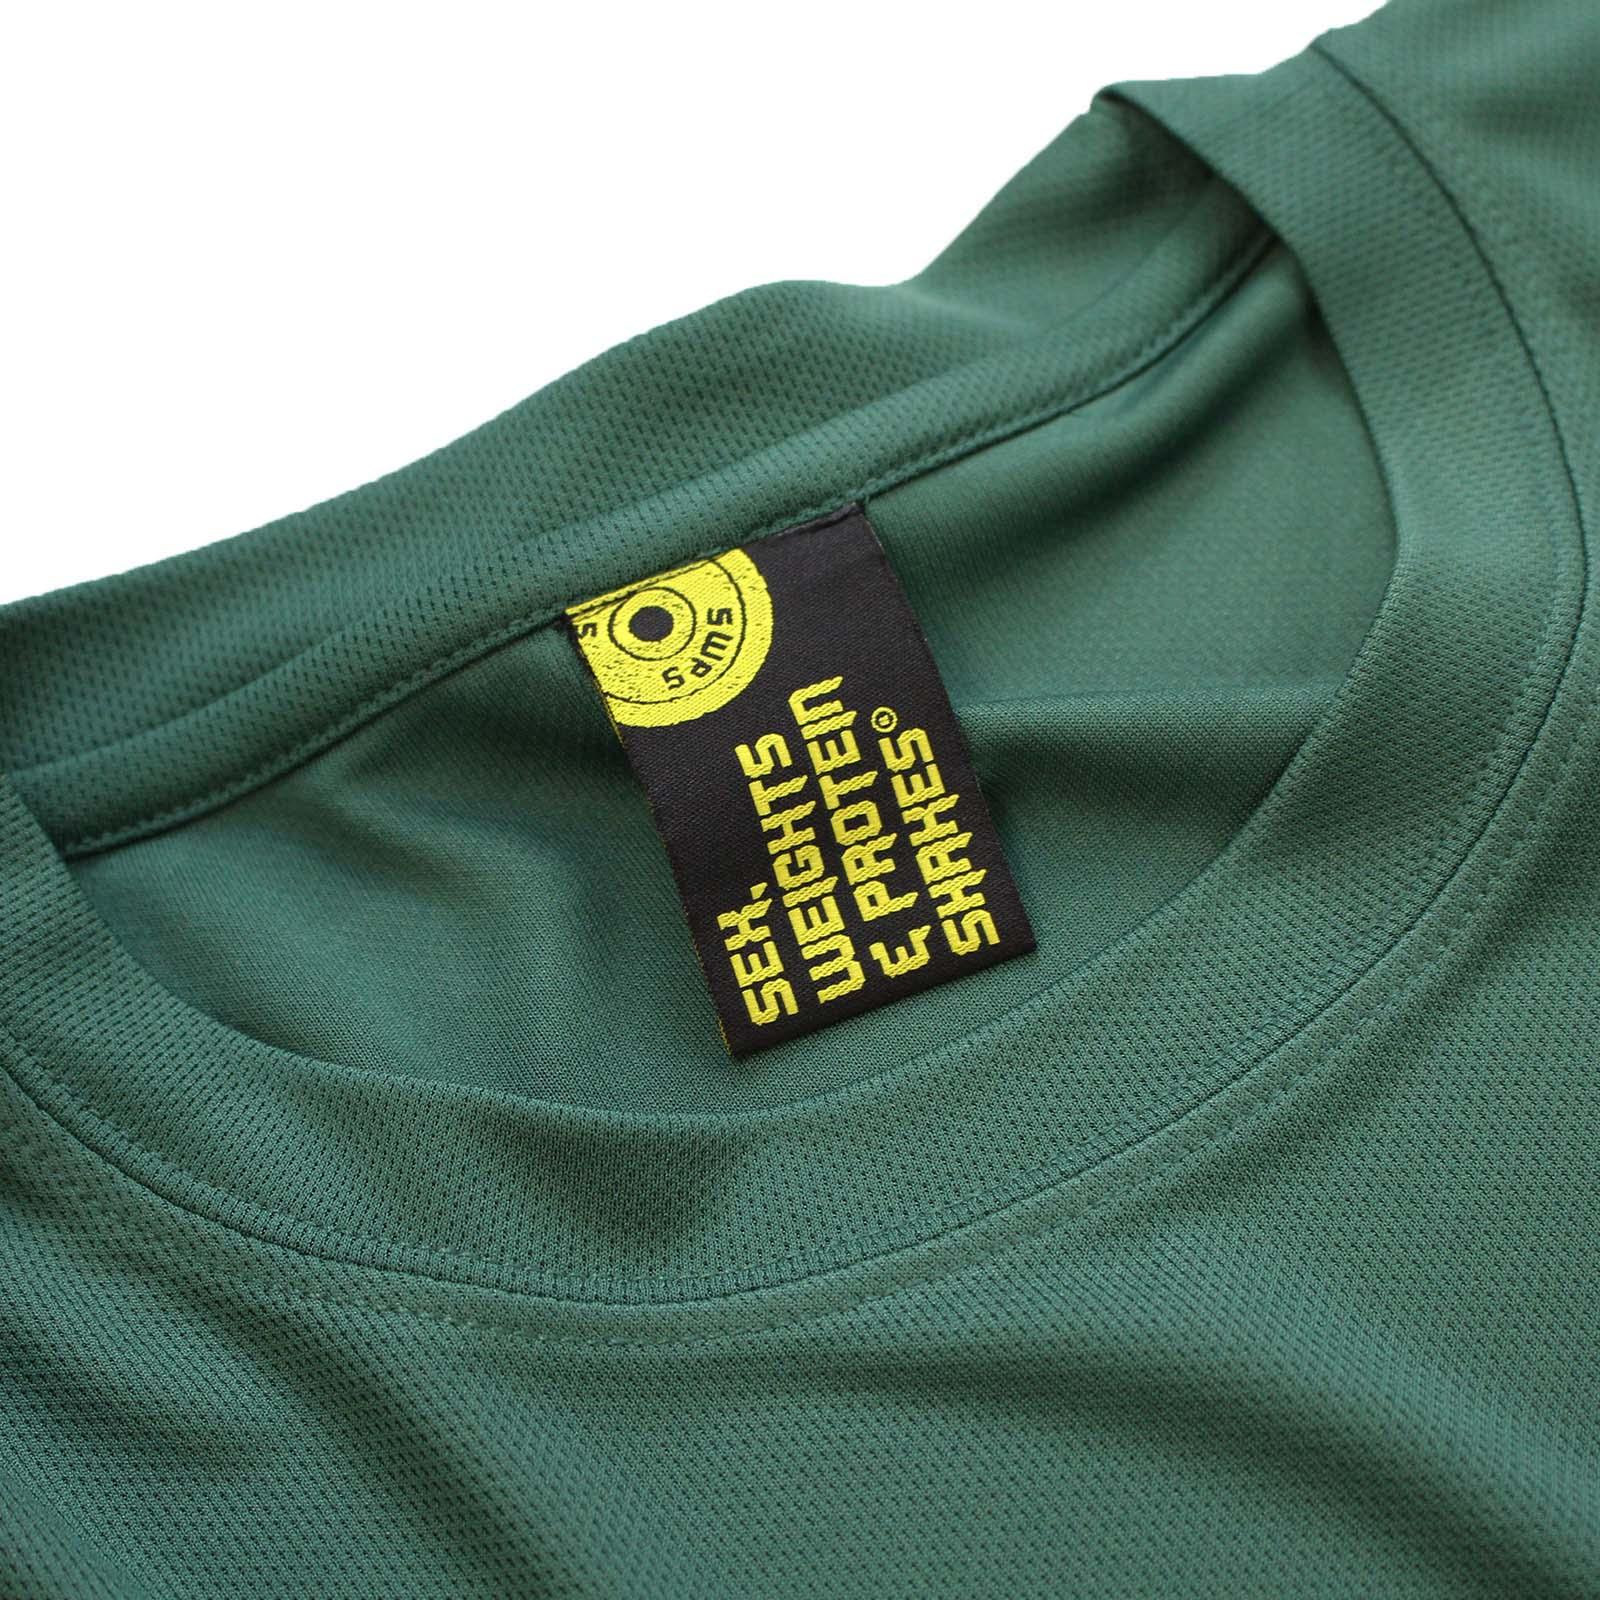 SWPS Gym Drug Of Choice Premium Dry Fit Sports T-SHIRT